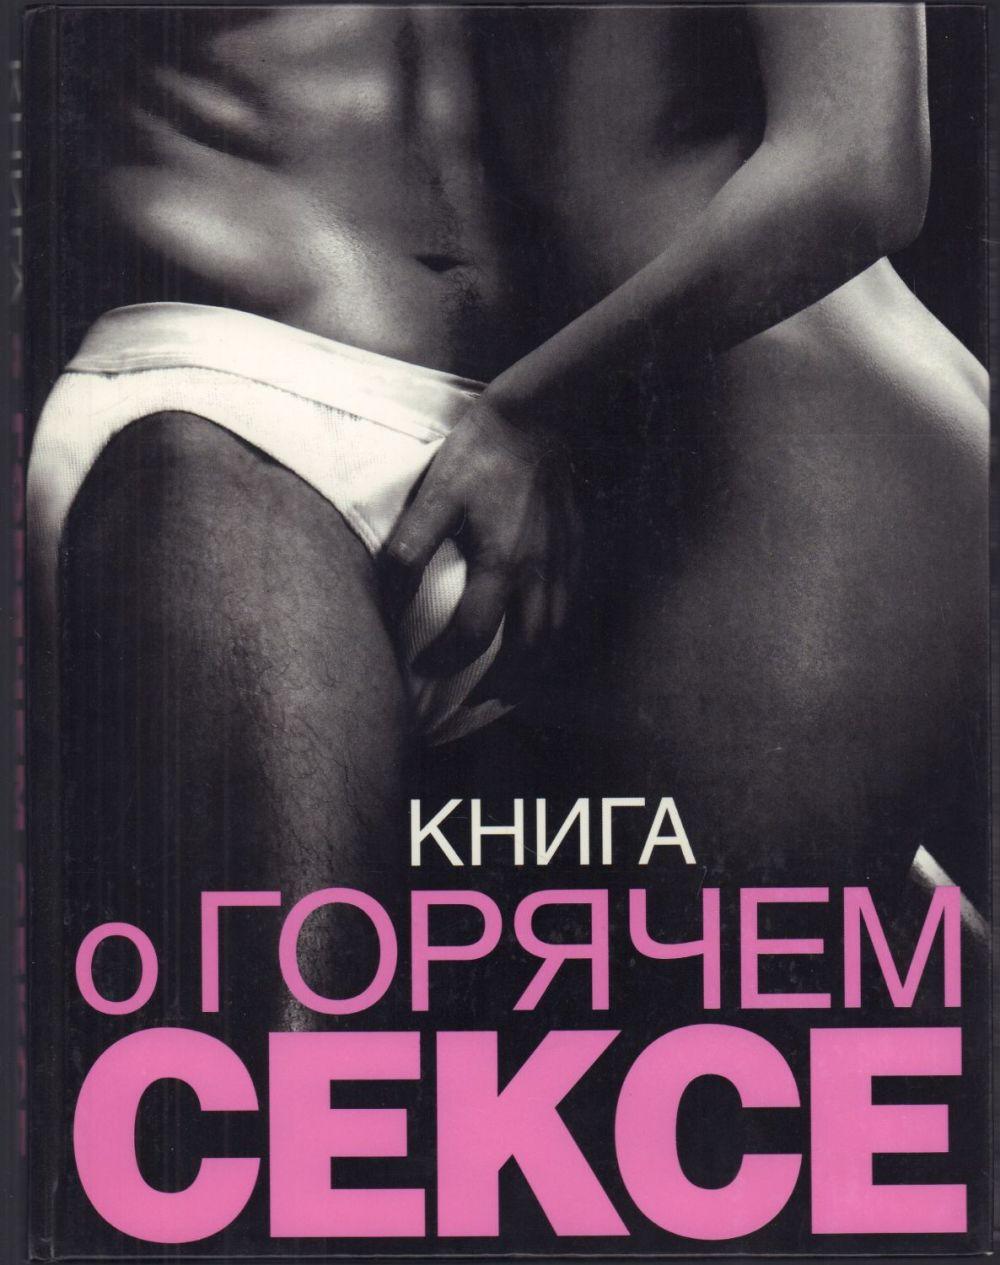 The best of erotica romance on twitter